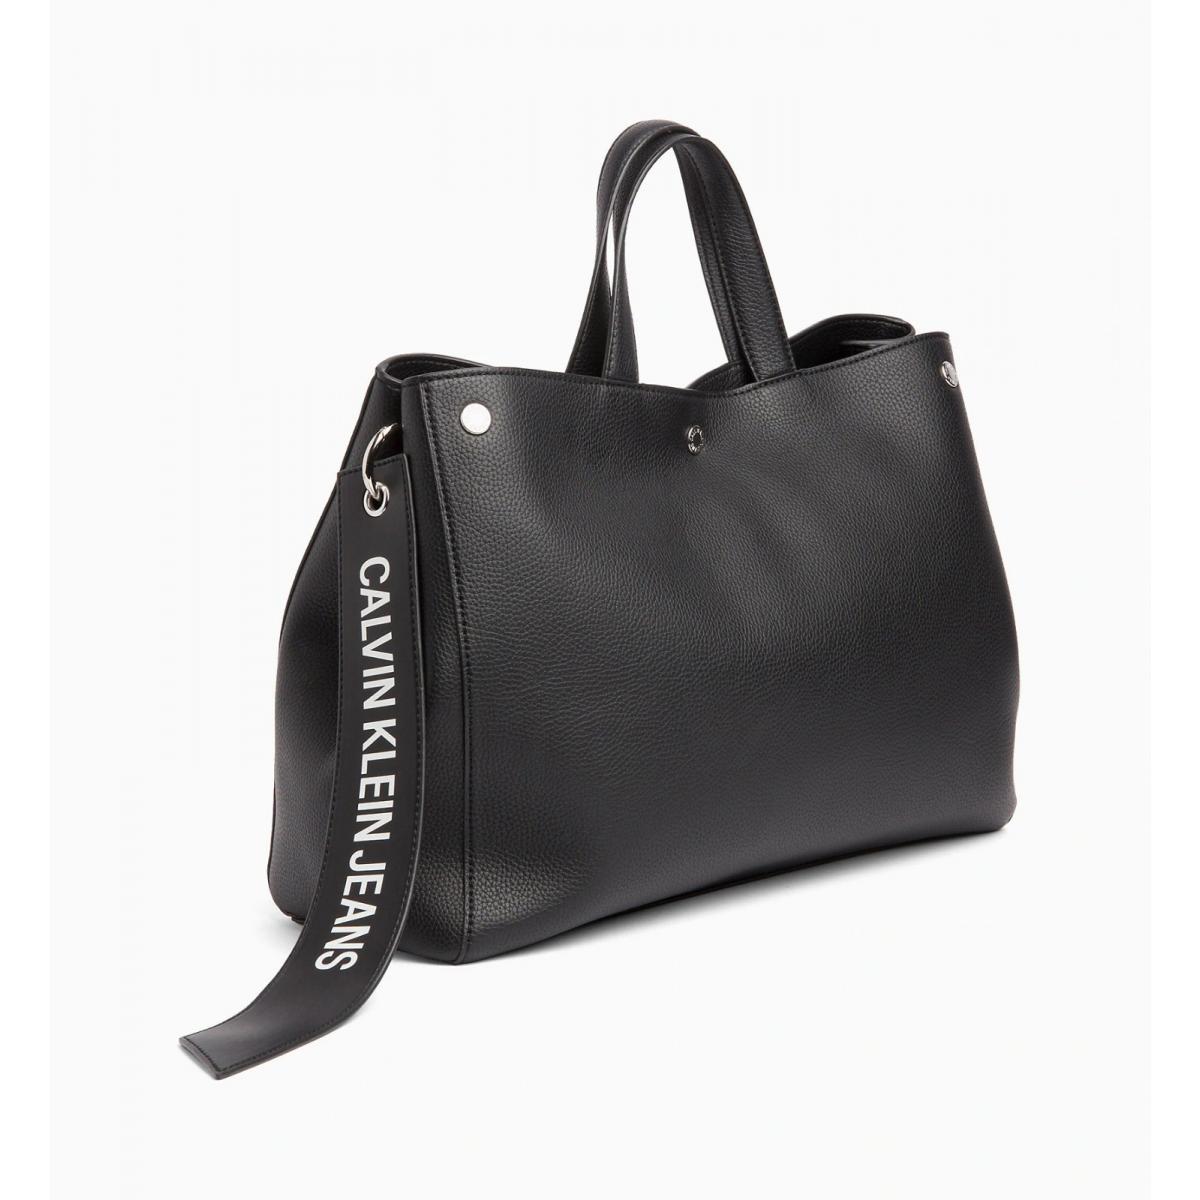 Borsa Calvin Klein Jeans tote con banner logo da donna rif. K40K400821